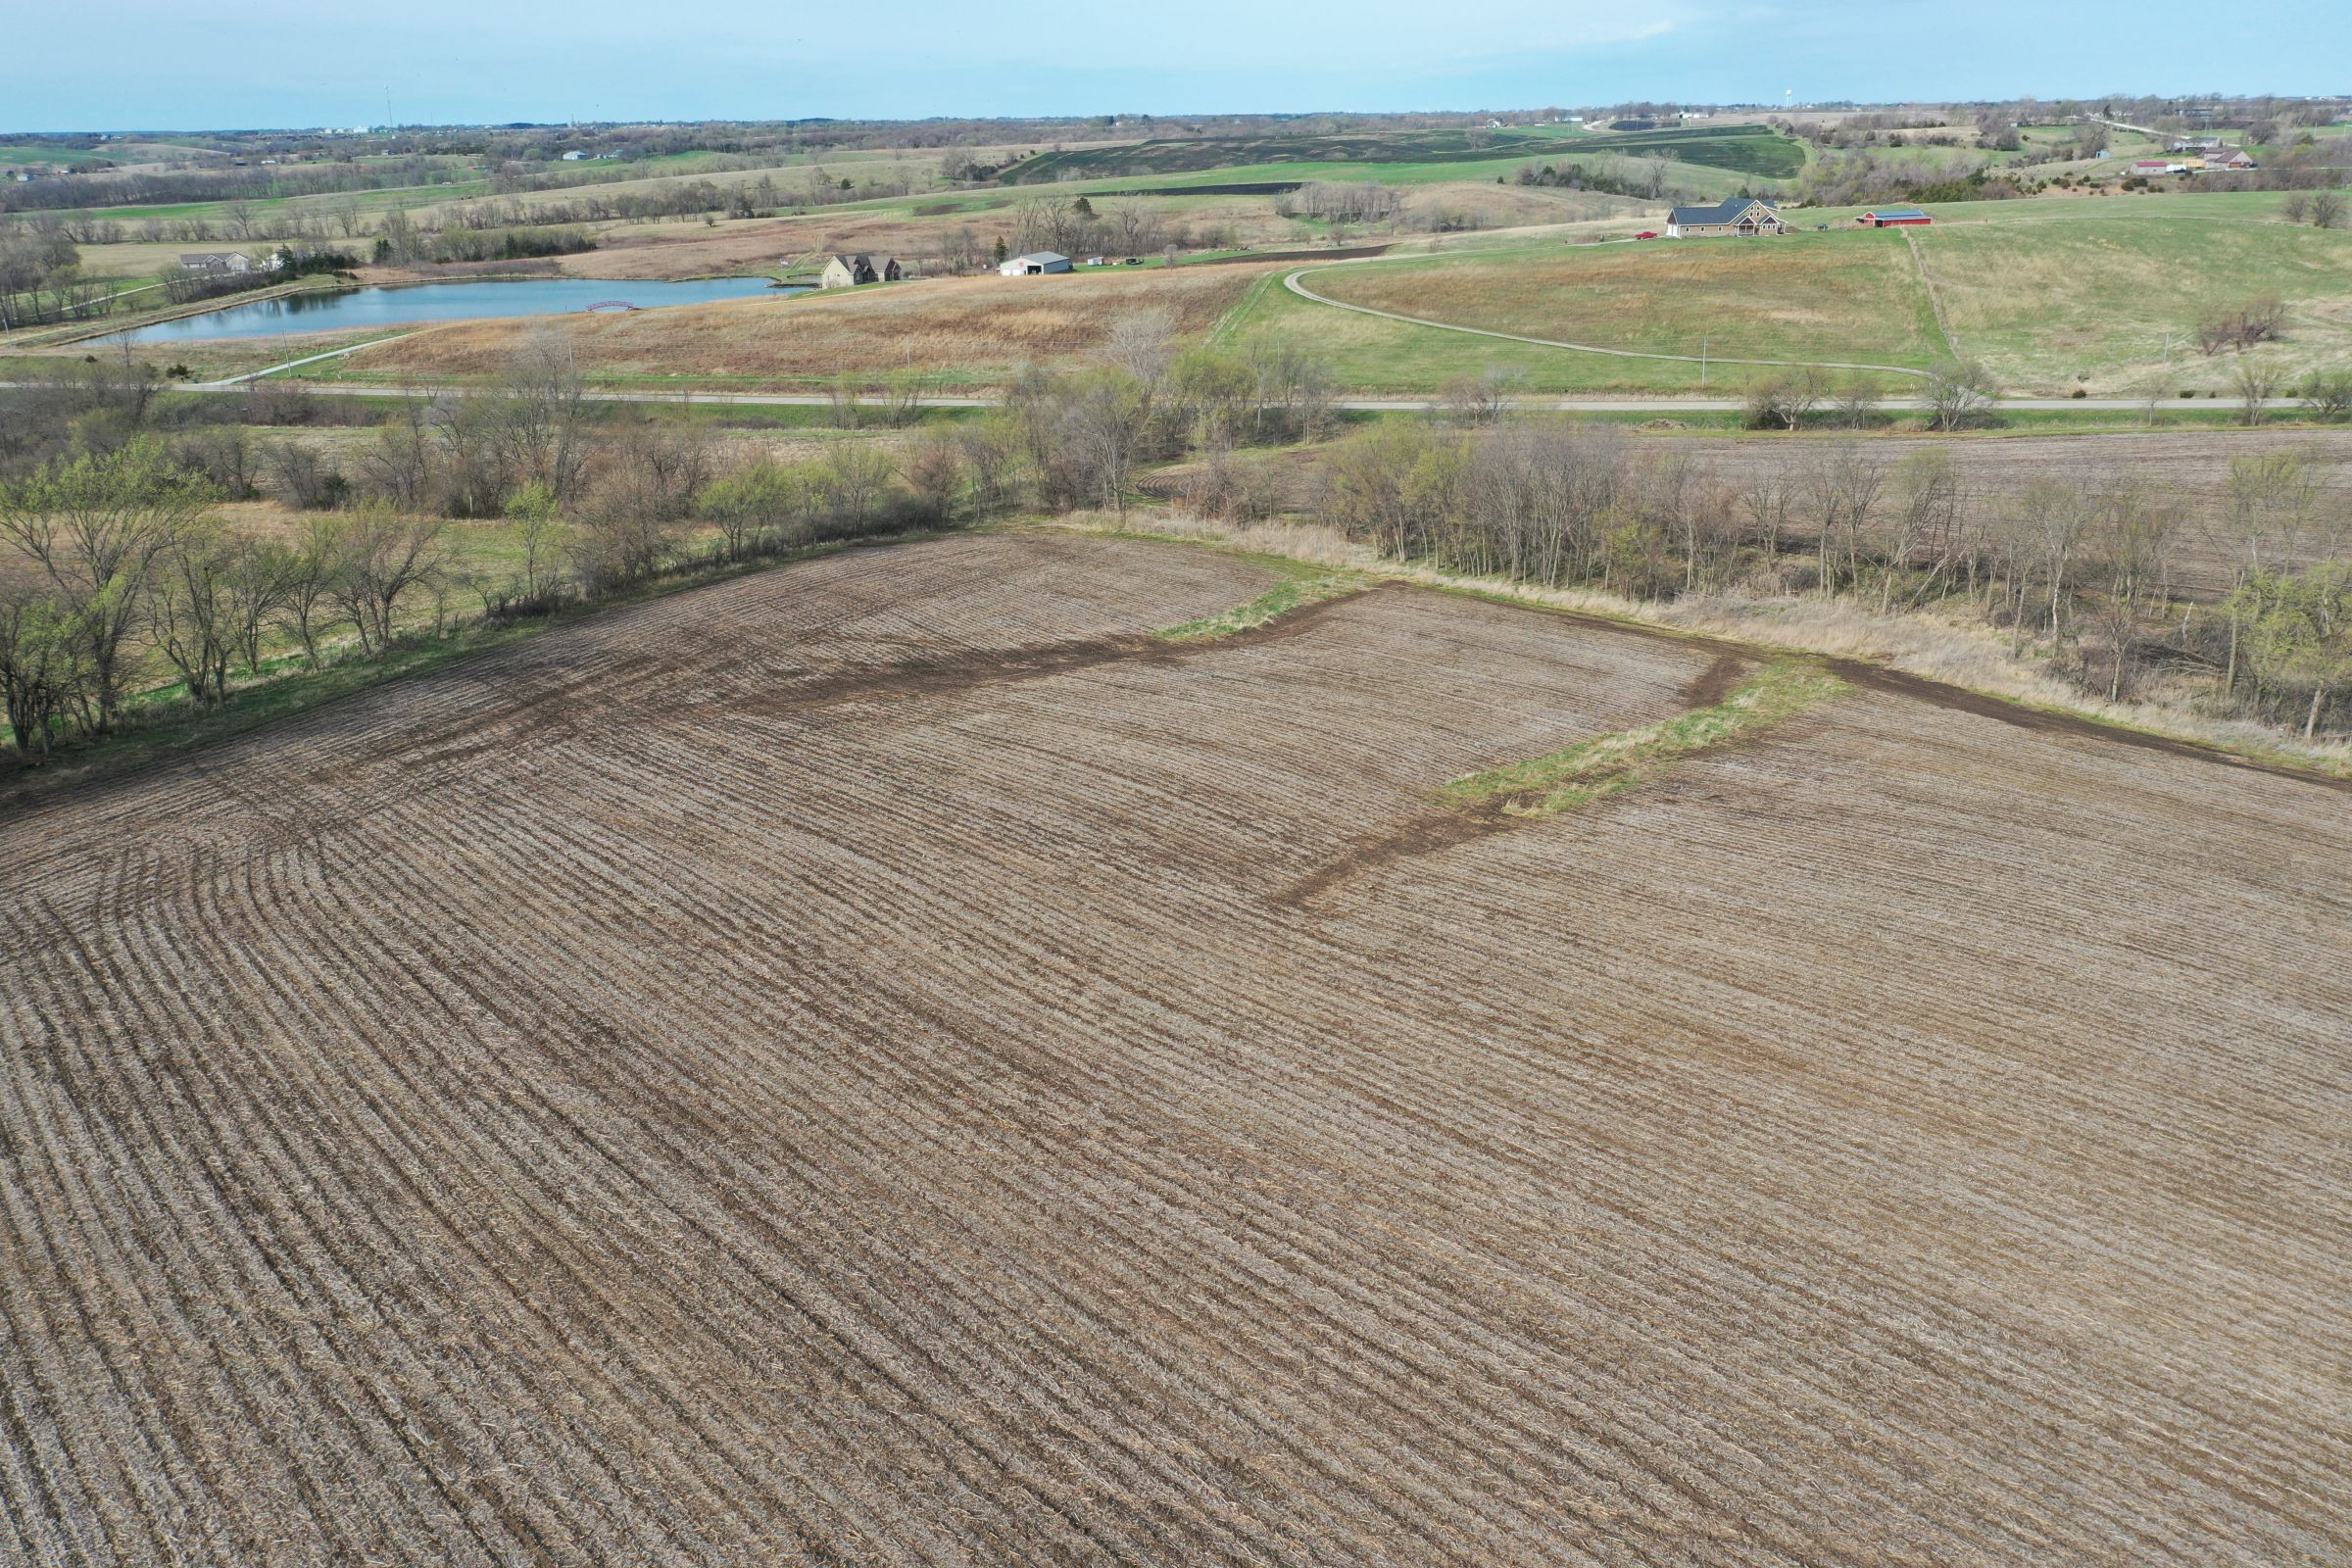 land-warren-county-iowa-3-acres-listing-number-15479-2-2021-04-21-190104.JPG